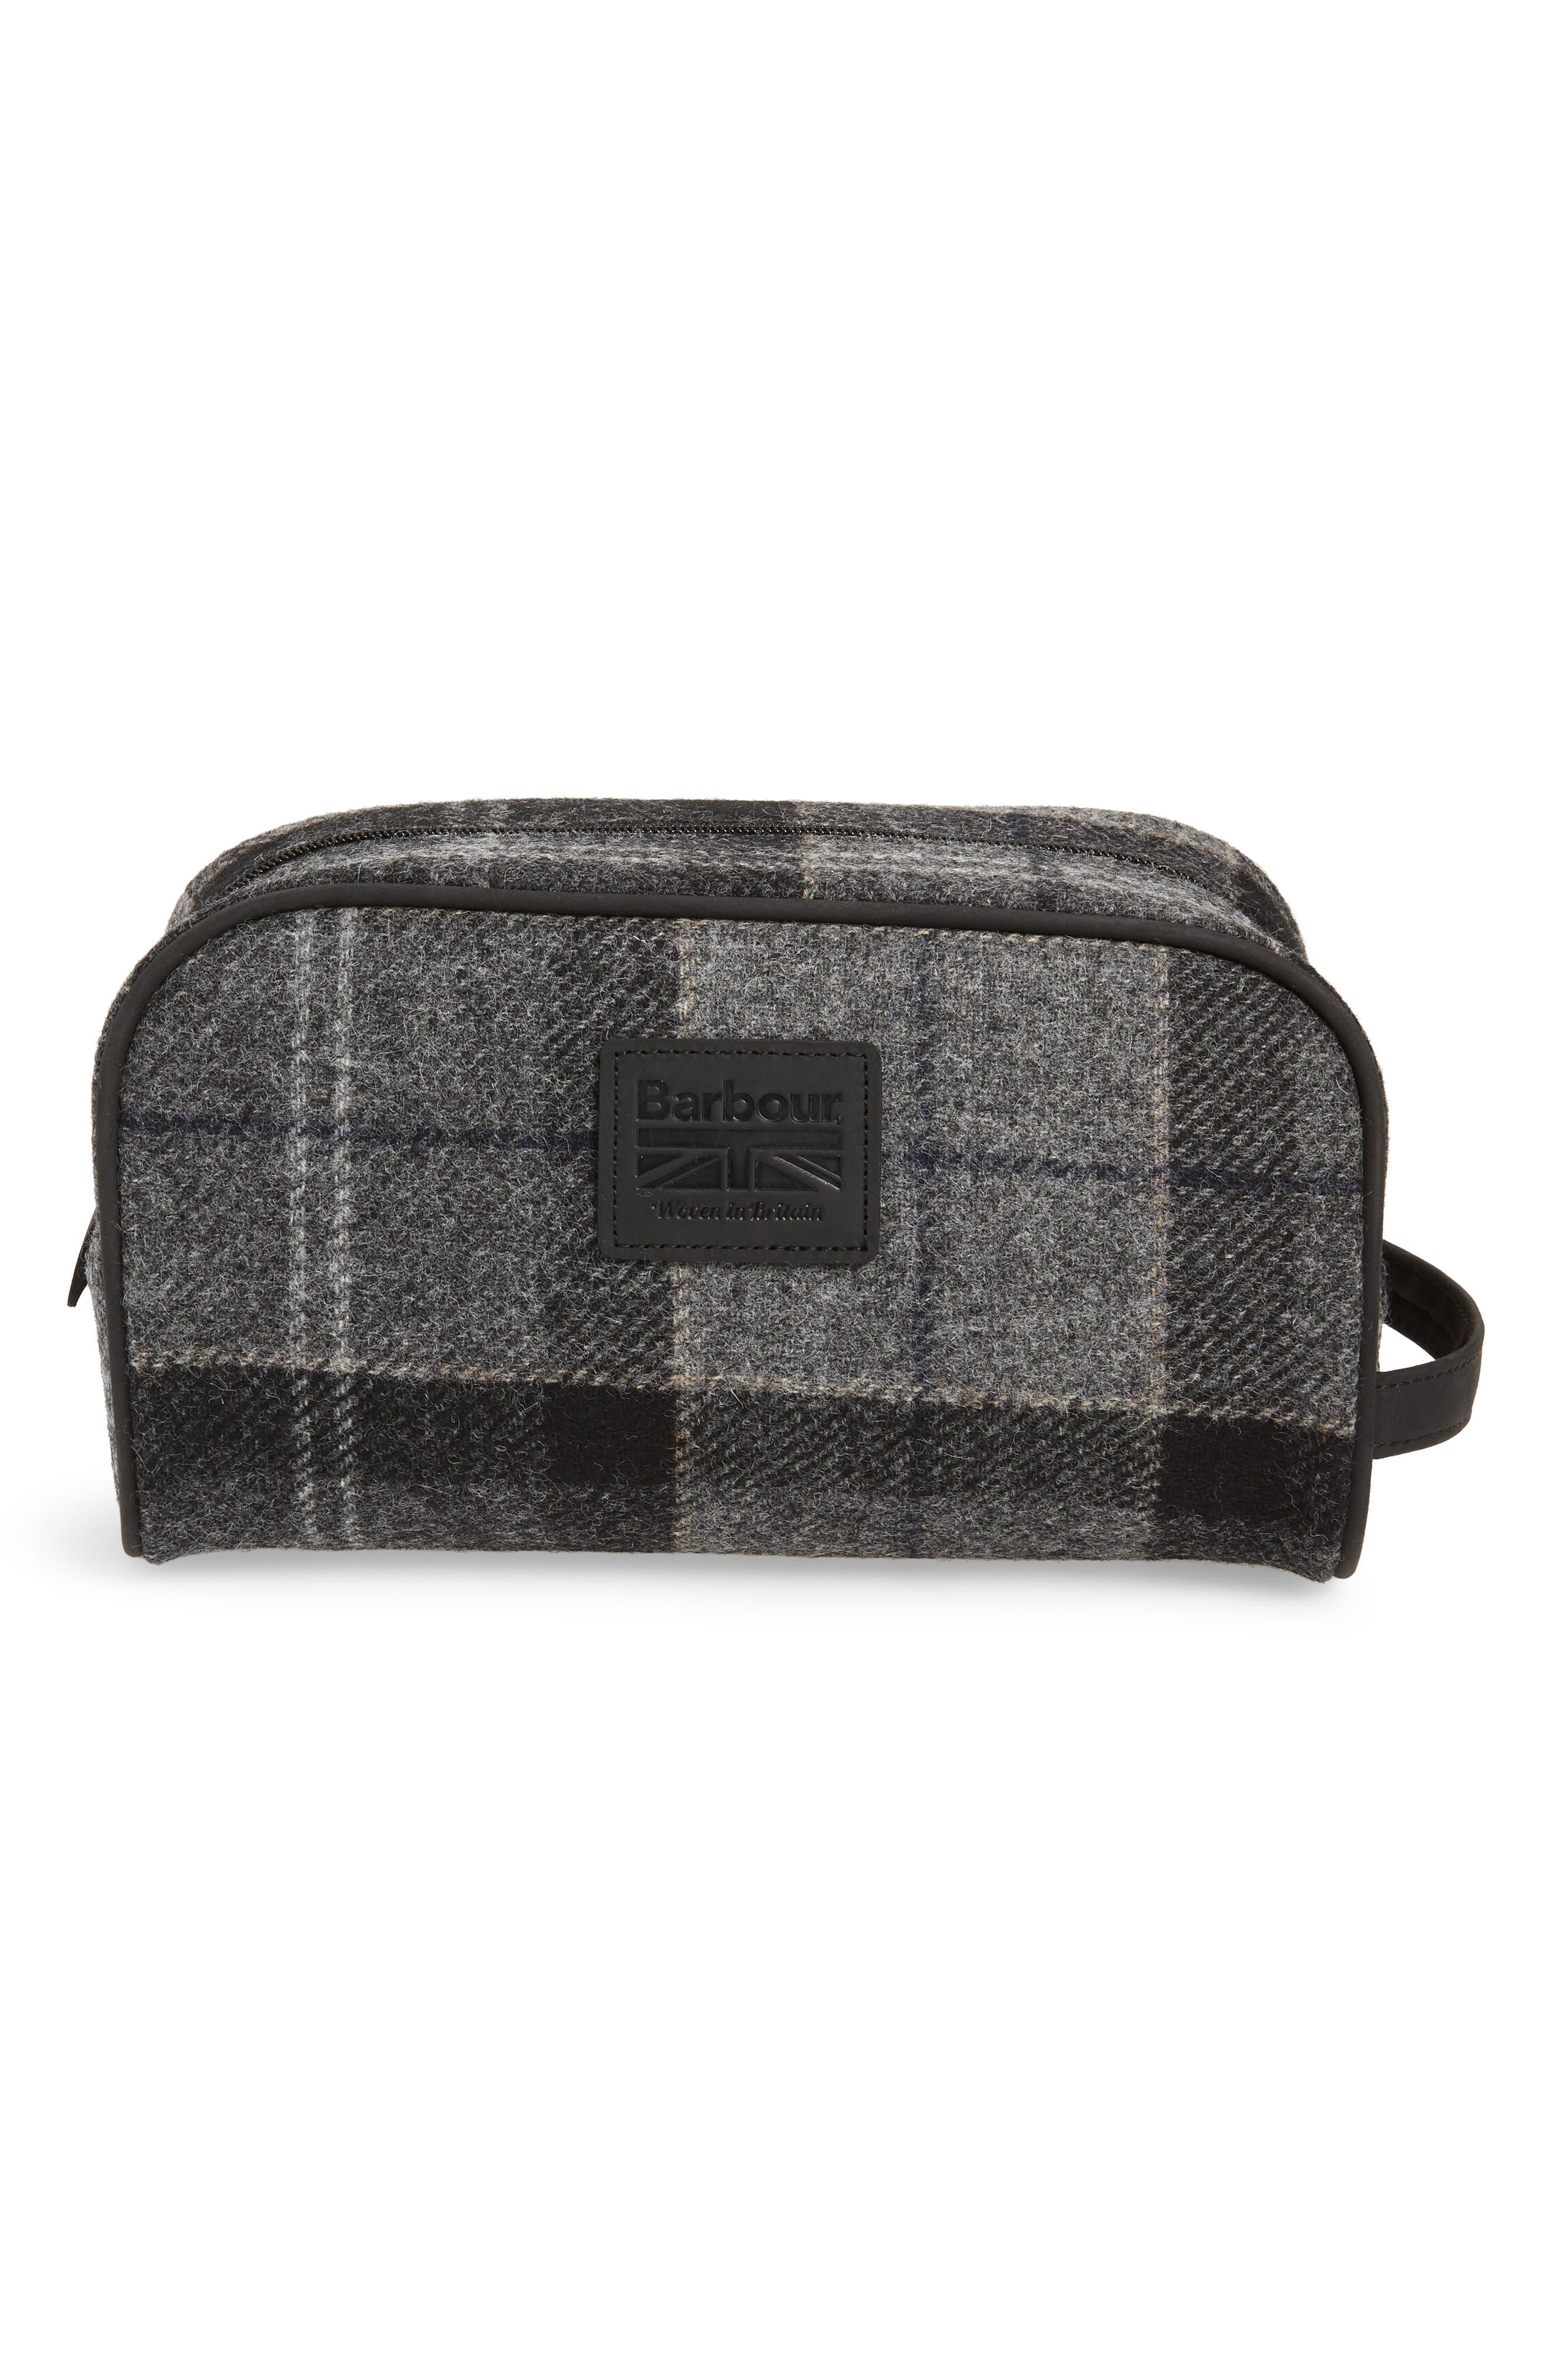 Shadow Tartan Wool Travel Kit,                             Alternate thumbnail 2, color,                             BLACK/ GREY TARTAN